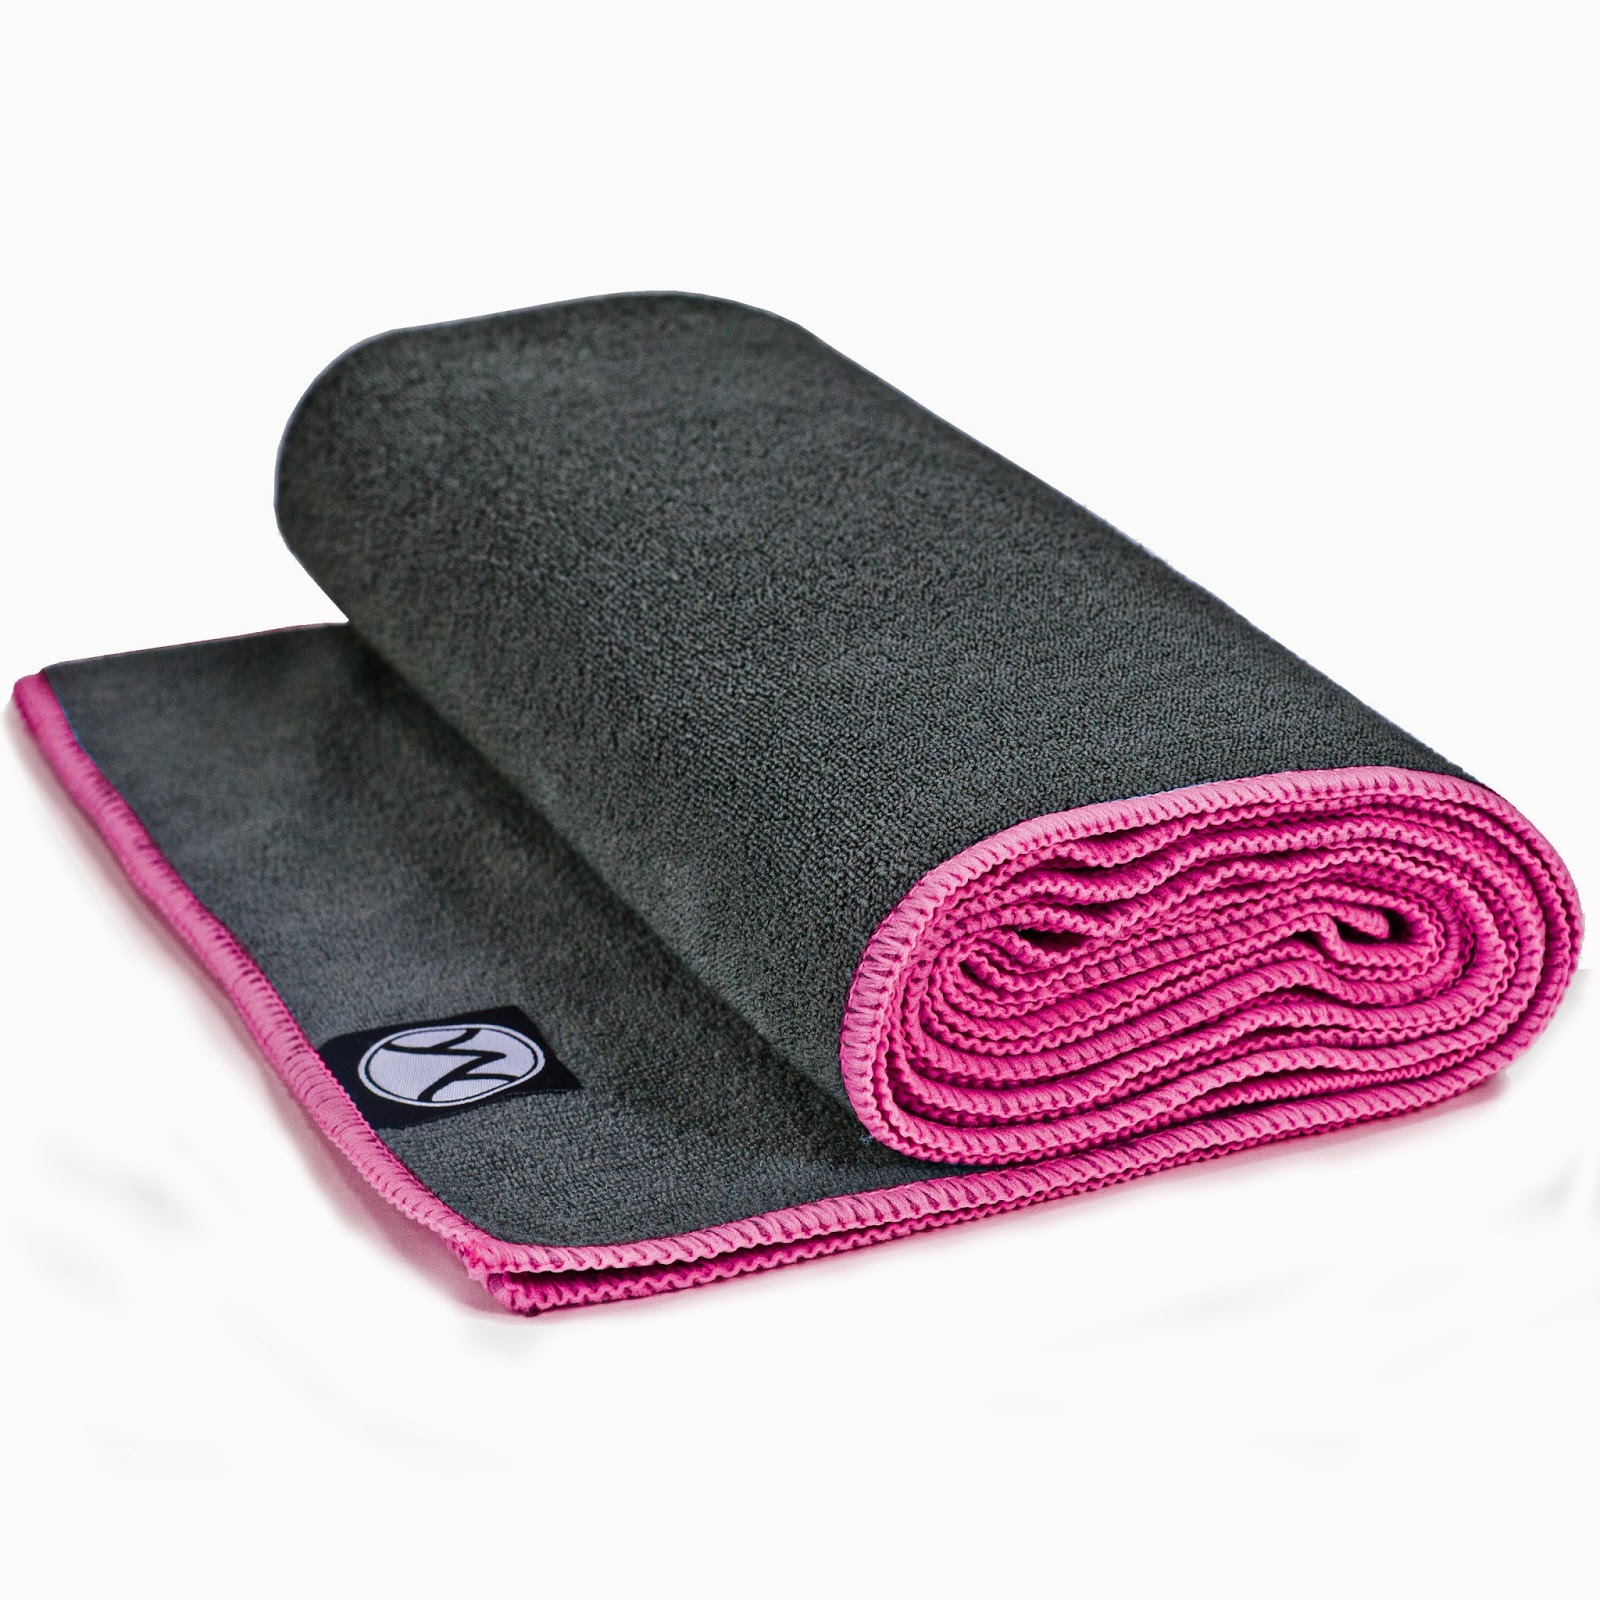 Workout Towel Kmart: Mygreatfinds: Youphoria Yoga Towel Review